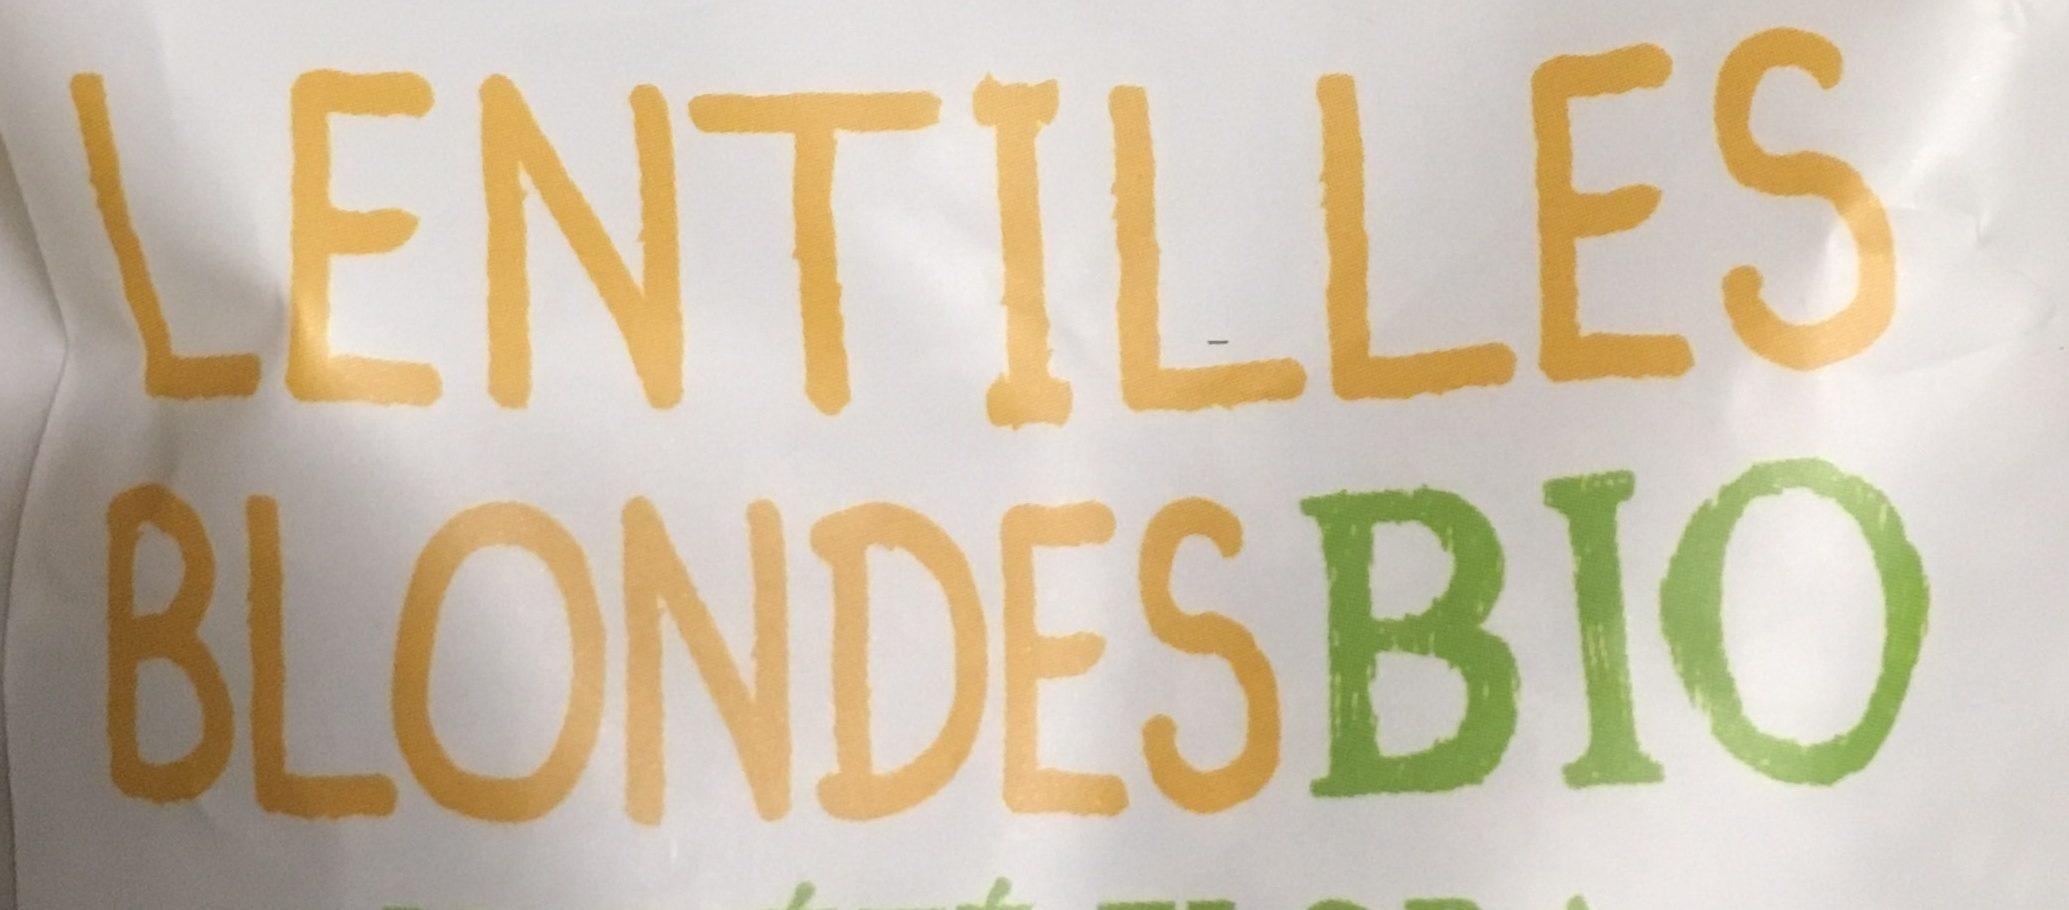 Lentilles blondes bio - Ingrediënten - fr